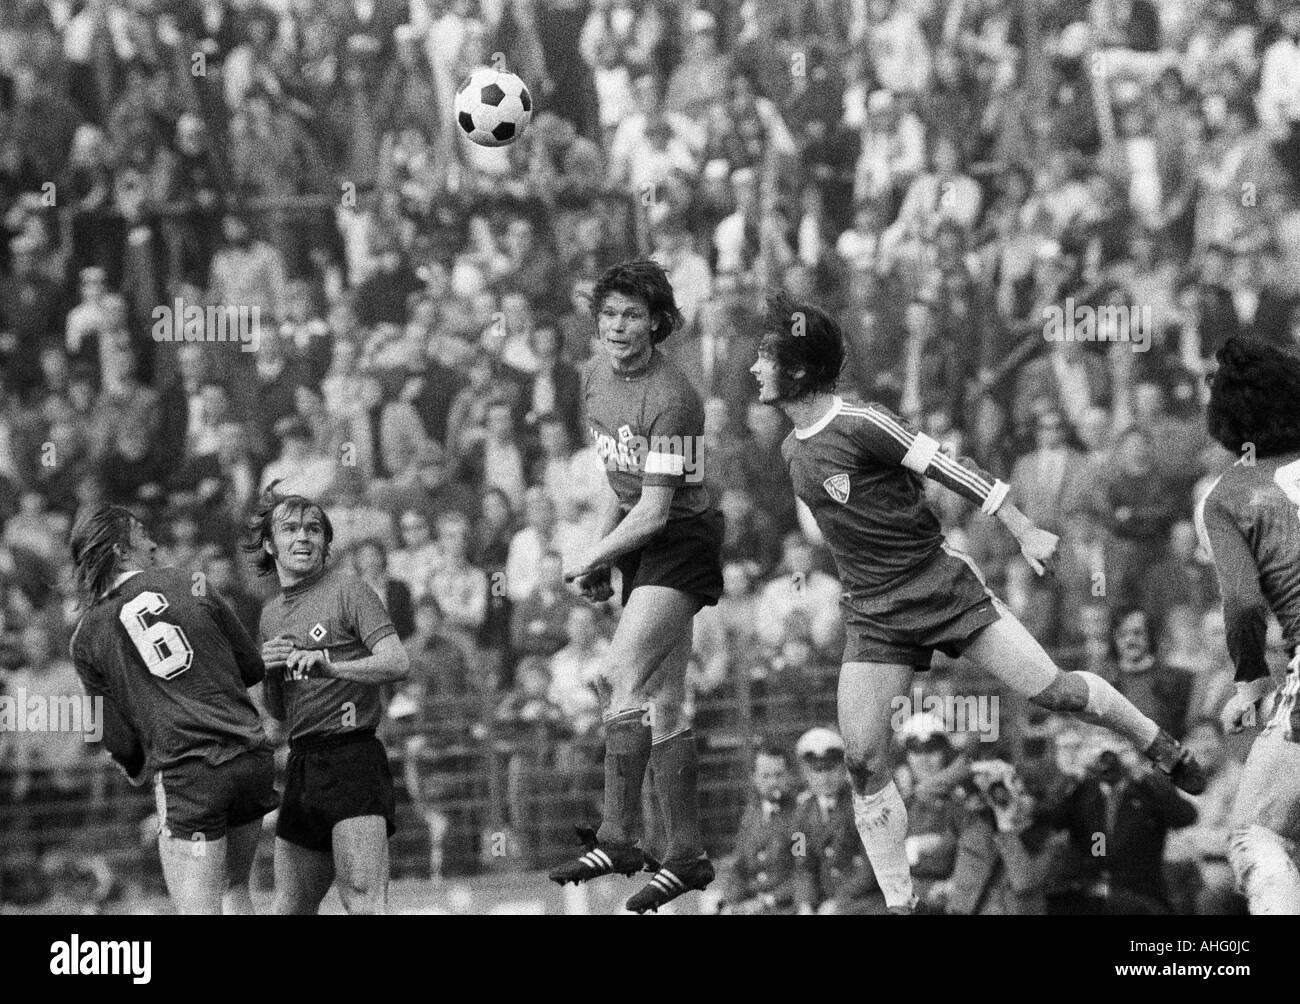 football, Bundesliga, 1973/1974, VfL Bochum versus Hamburger SV 2:0, Stadium at the Castroper Strasse in Bochum, scene of the match, f.l.t.r. Jupp Tenhagen (Bochum), Klaus Zaczyk (HSV), Peter Nogly (HSV), Hans Walitza (Bochum) - Stock Image